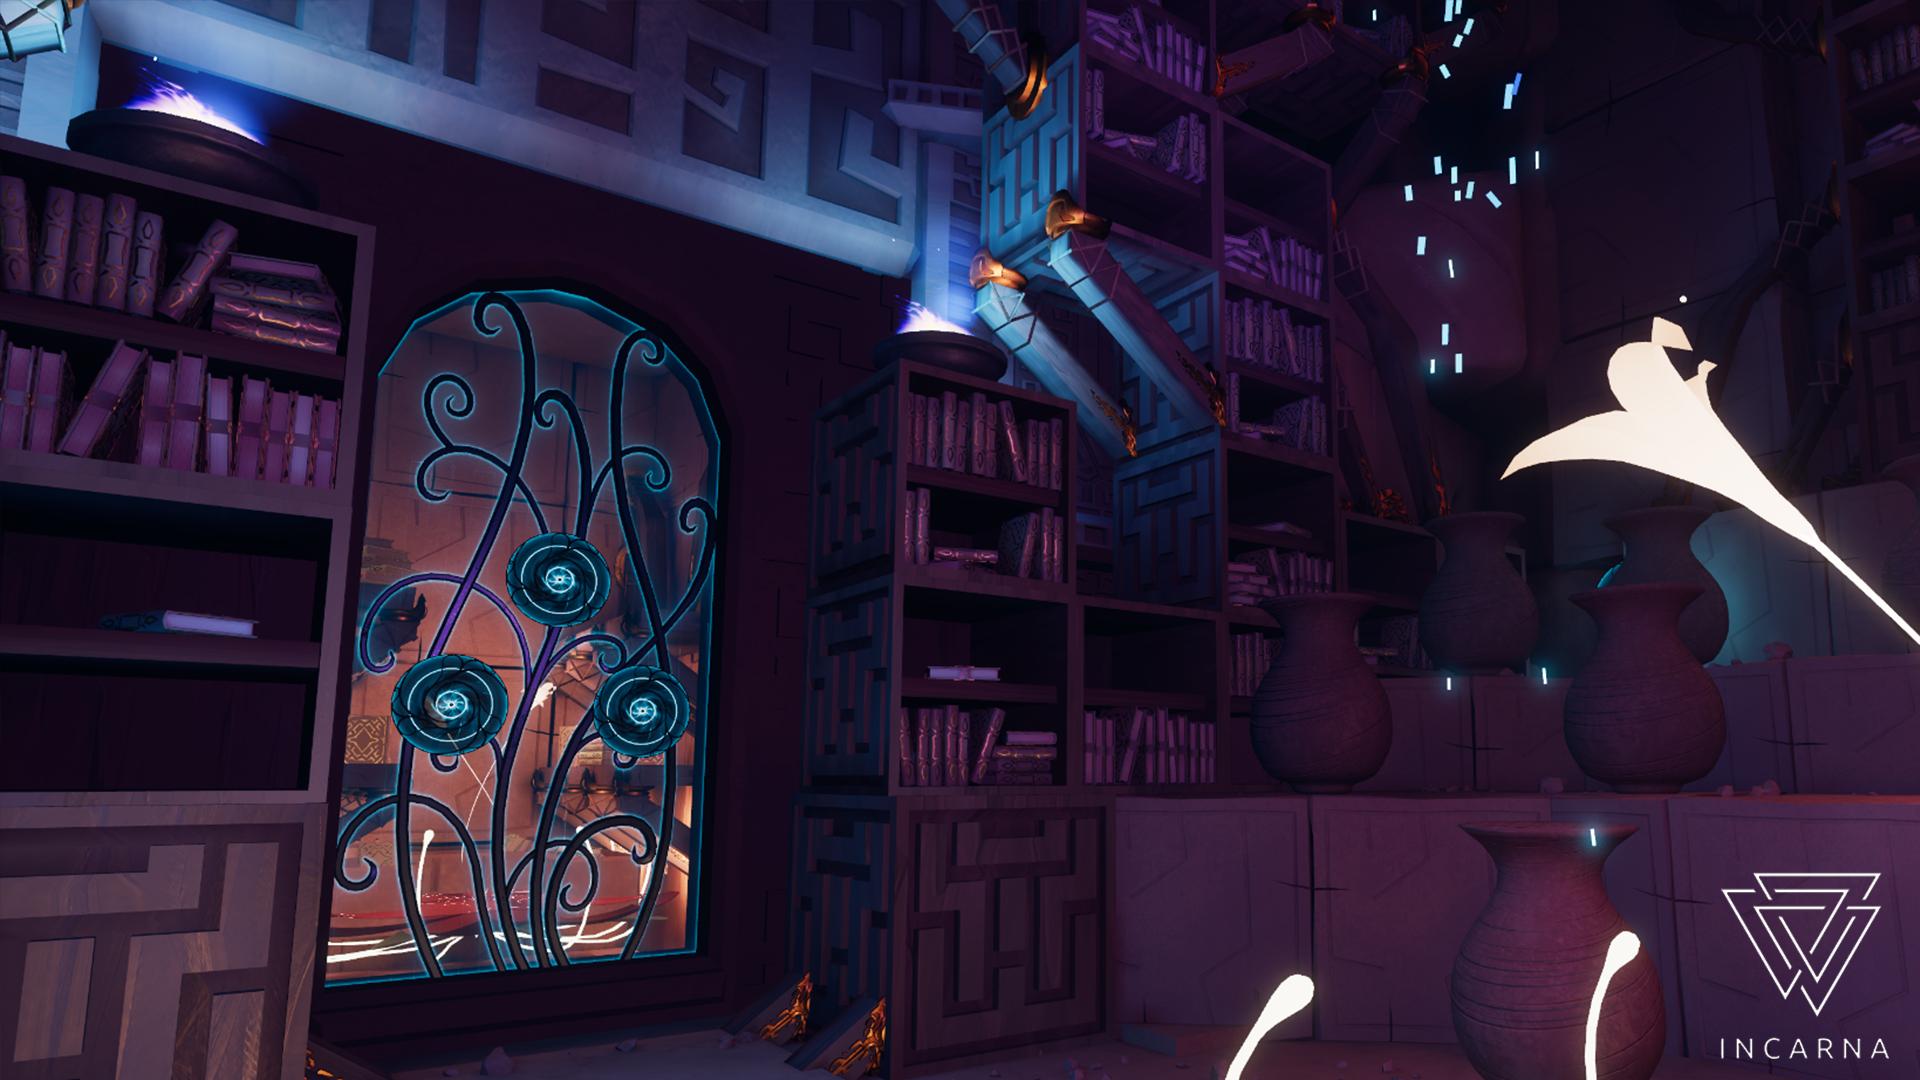 Incarna Ch 1 Escape Room